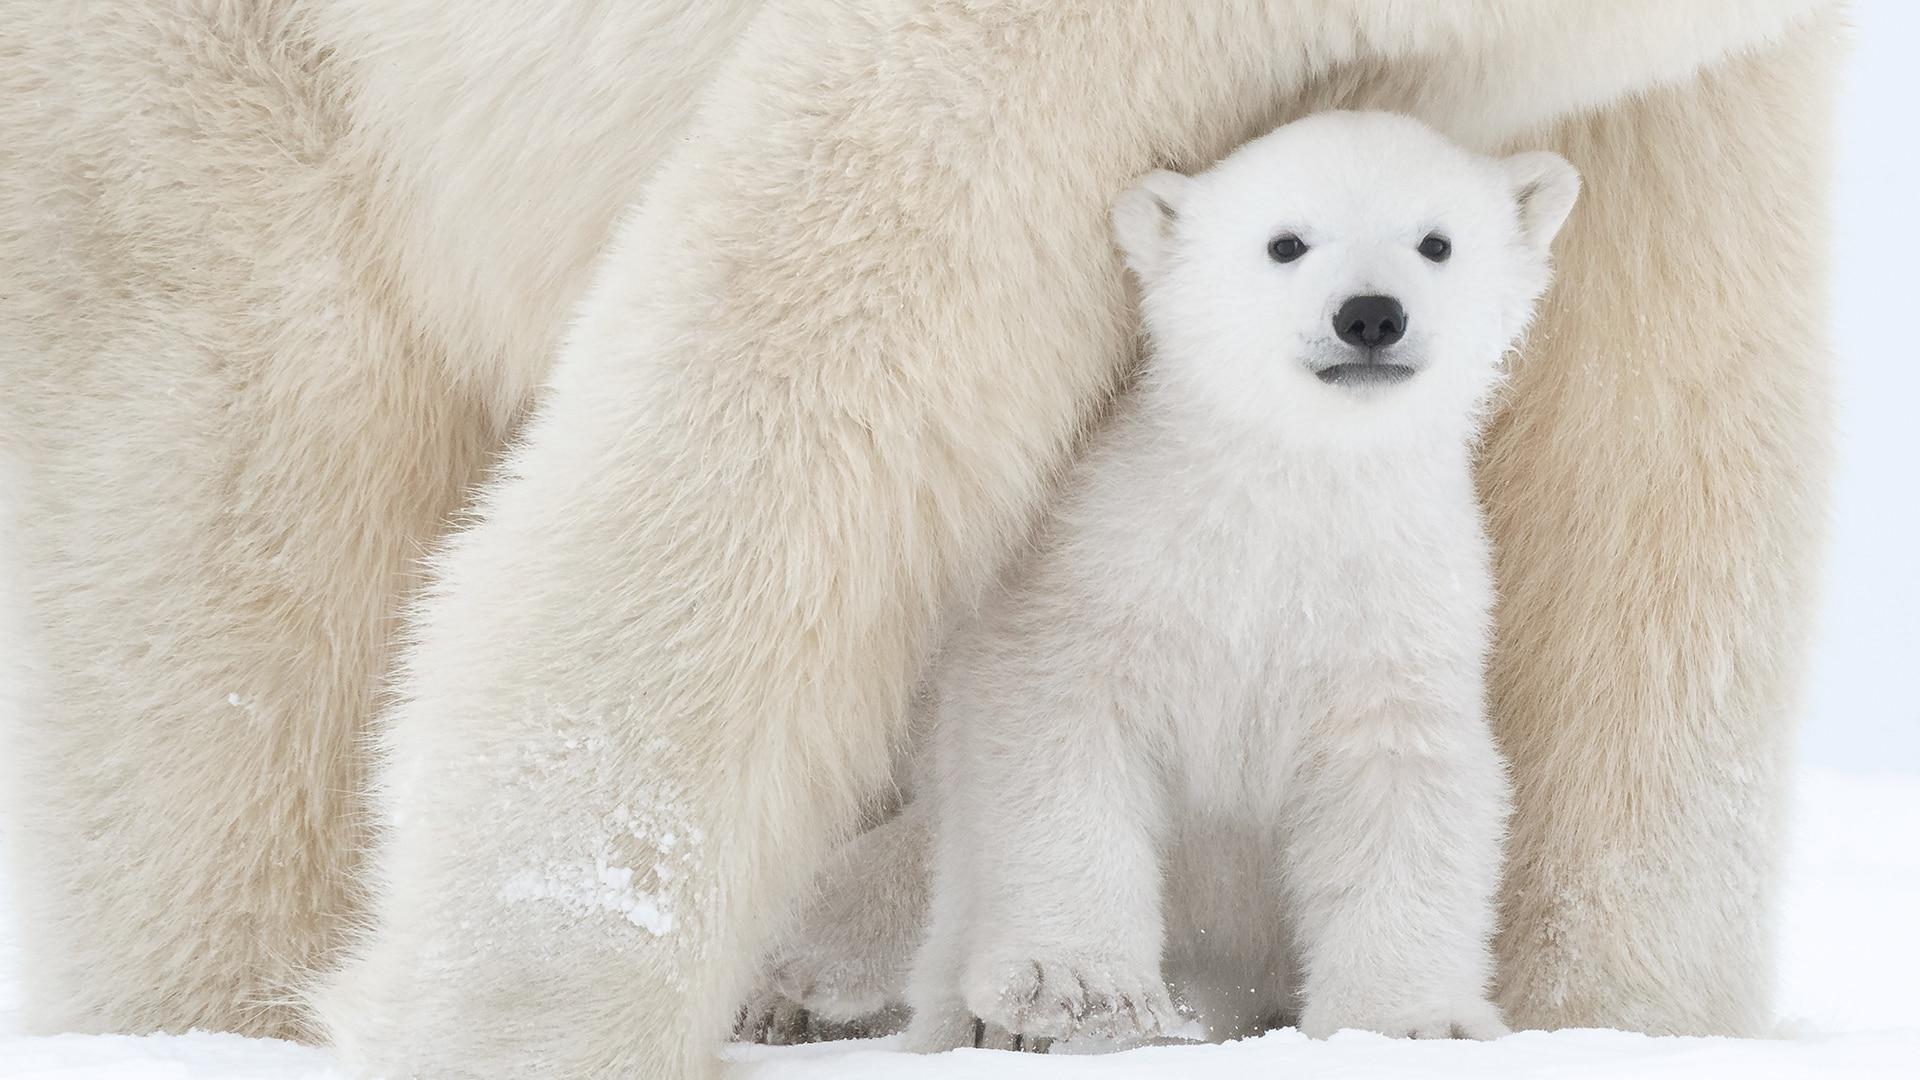 Polar bear cub in Wapusk National Park, Canada